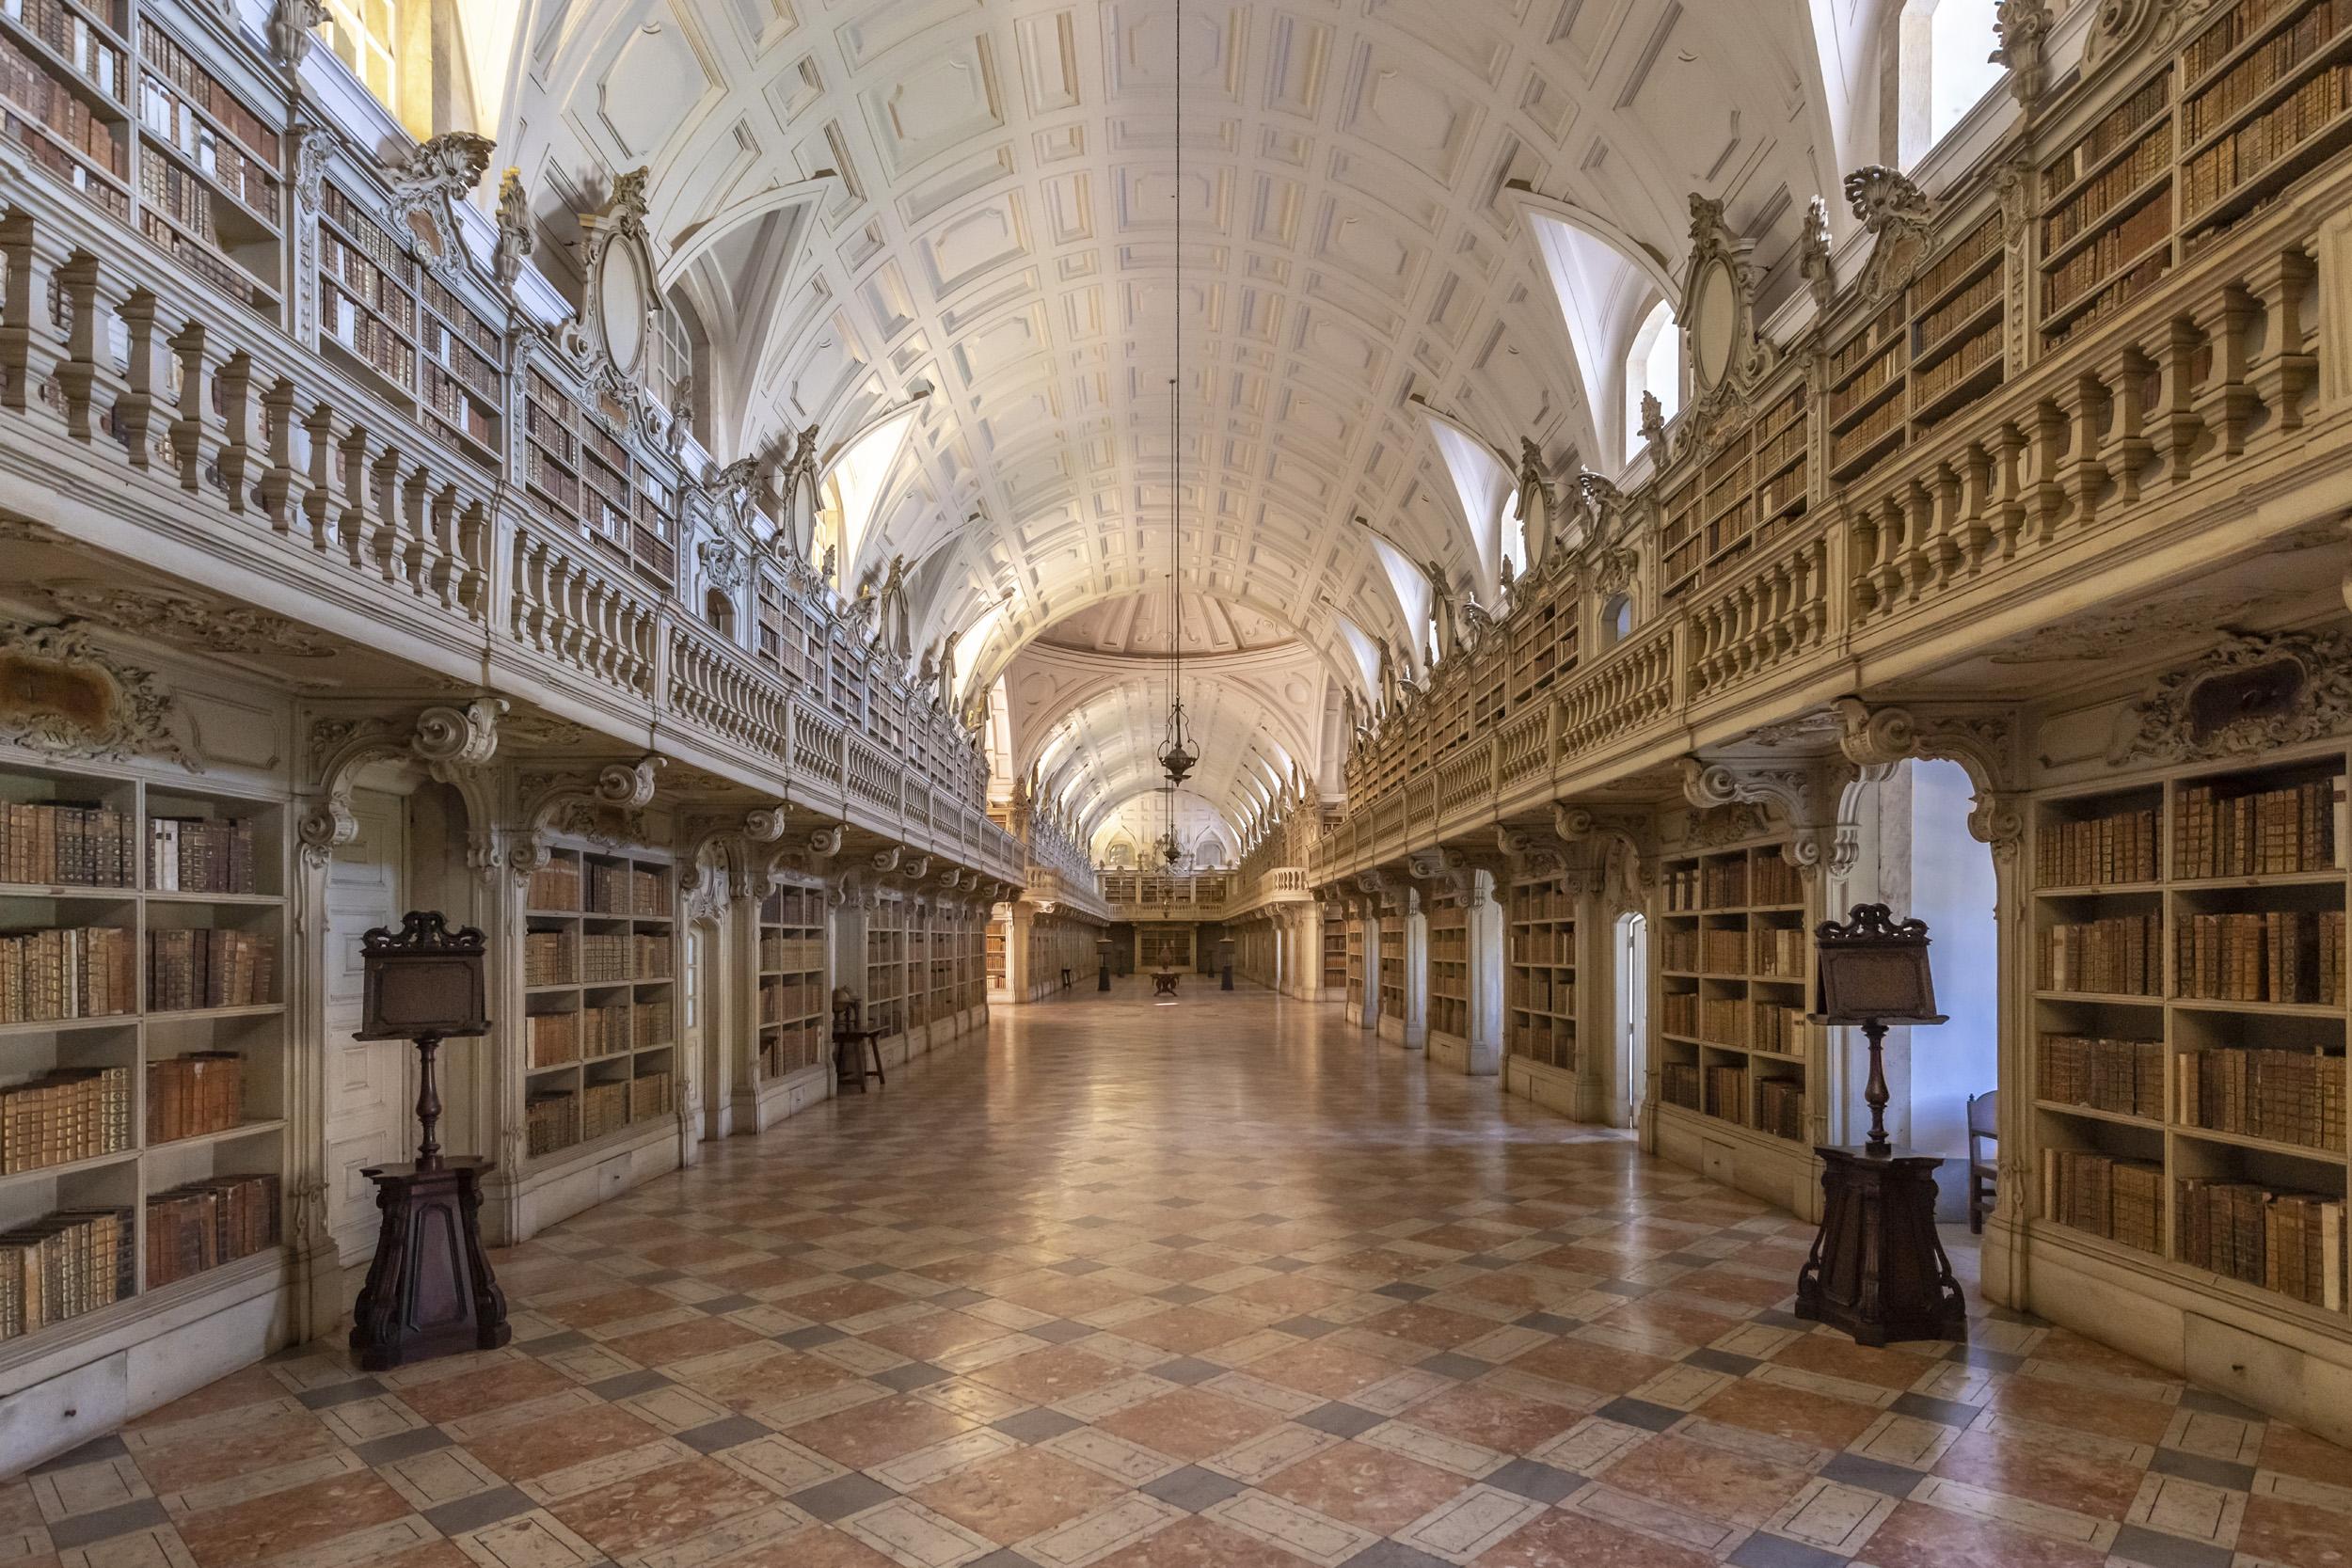 Mafra Library, Portugal